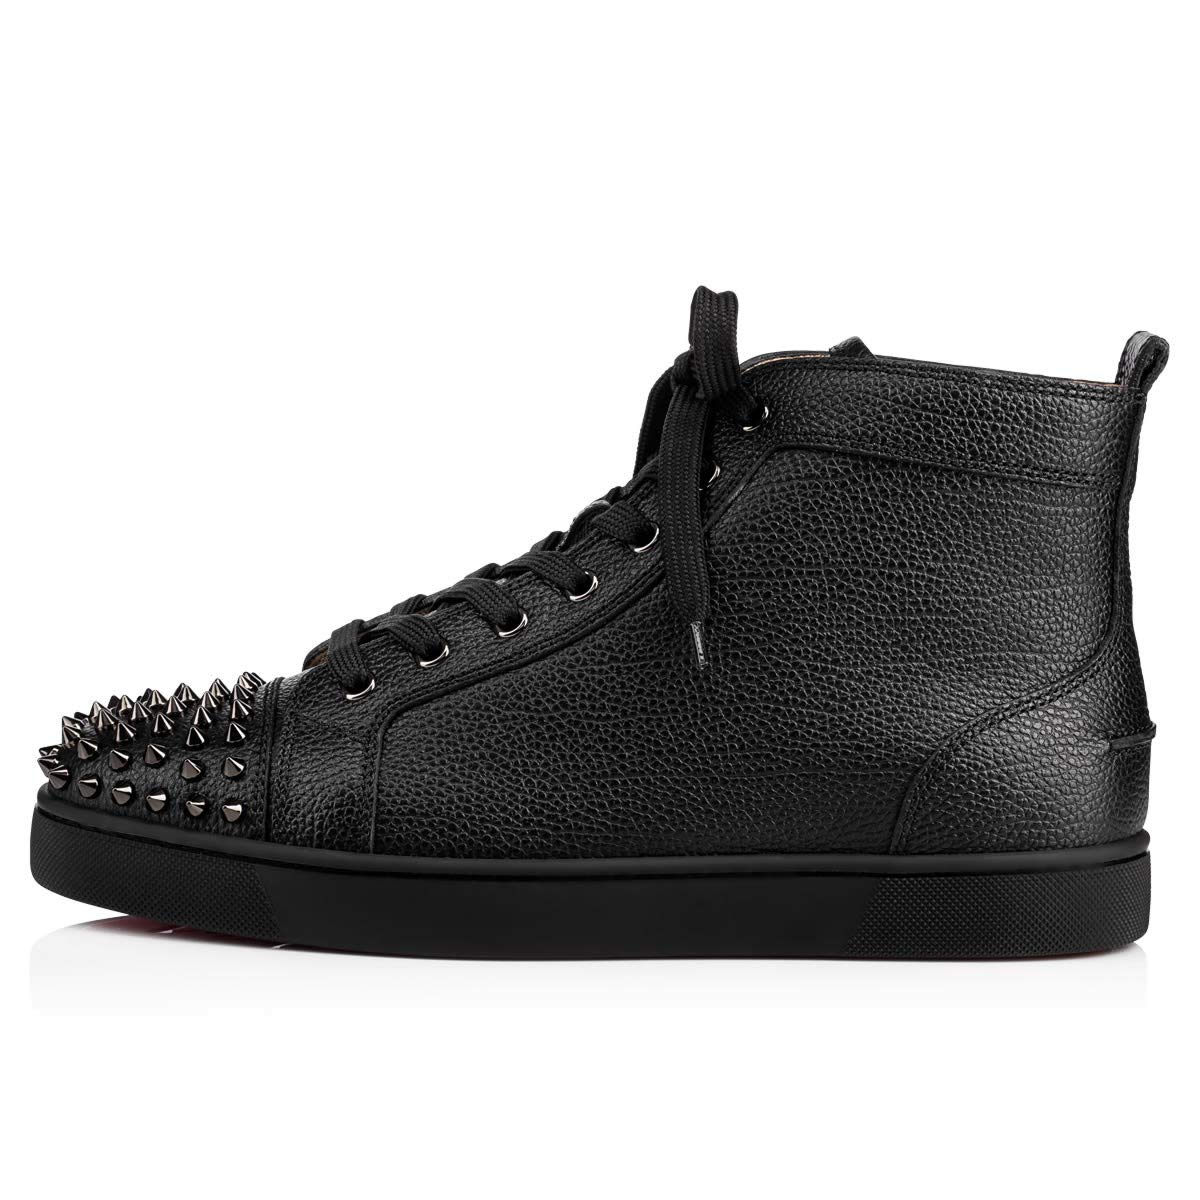 d866555b52aa Christian Louboutin Lou Spikes Flat Calf Graine High Top - Black 40 EUR   Amazon.co.uk  Shoes   Bags